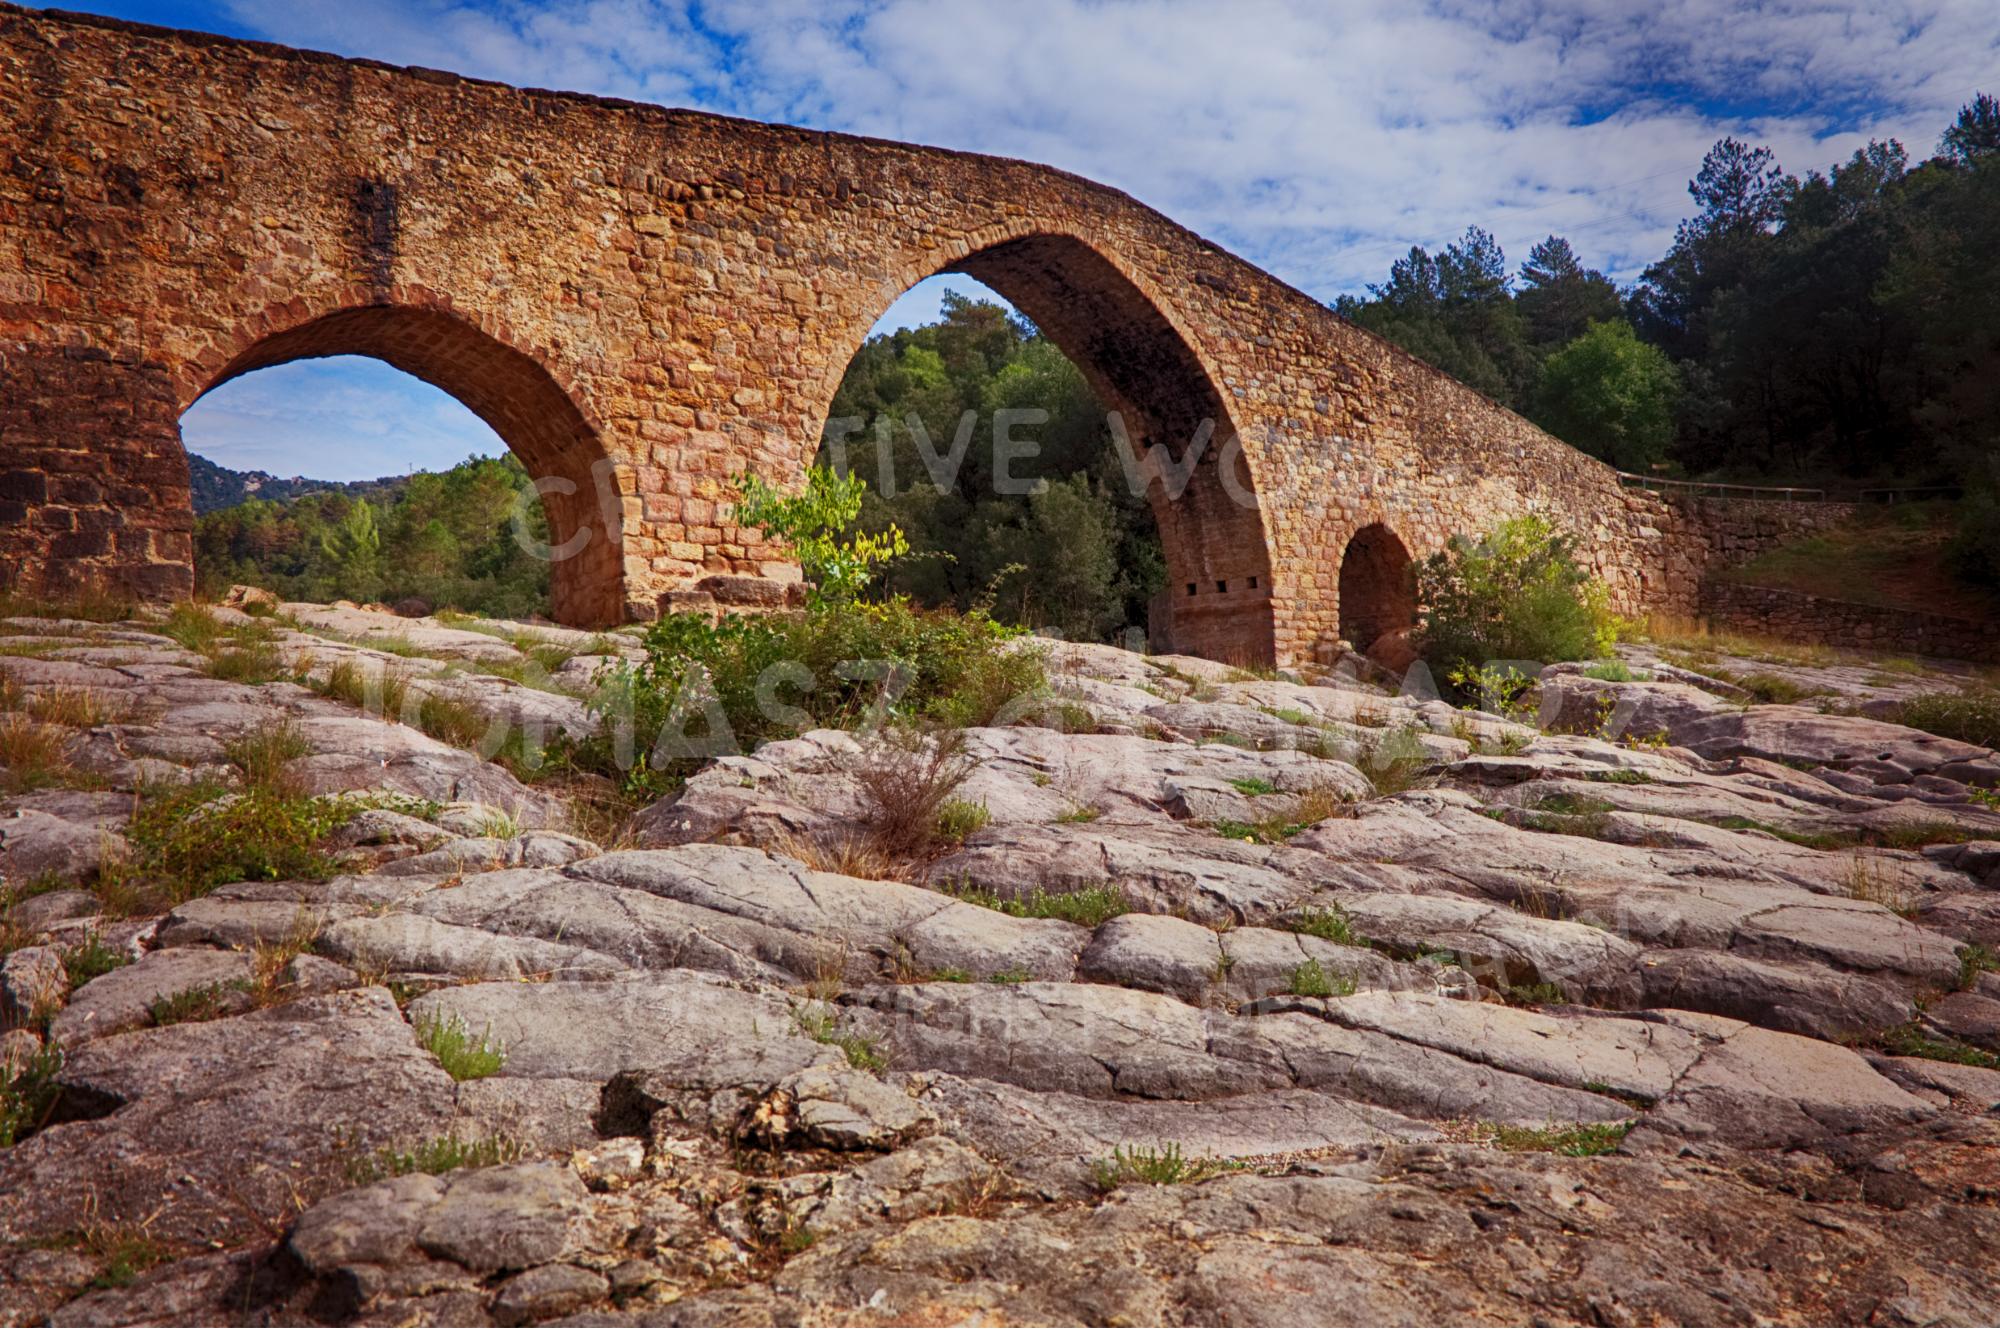 Gothic Stone Bridge Over The River Llobregat Photo Bundle example image 3